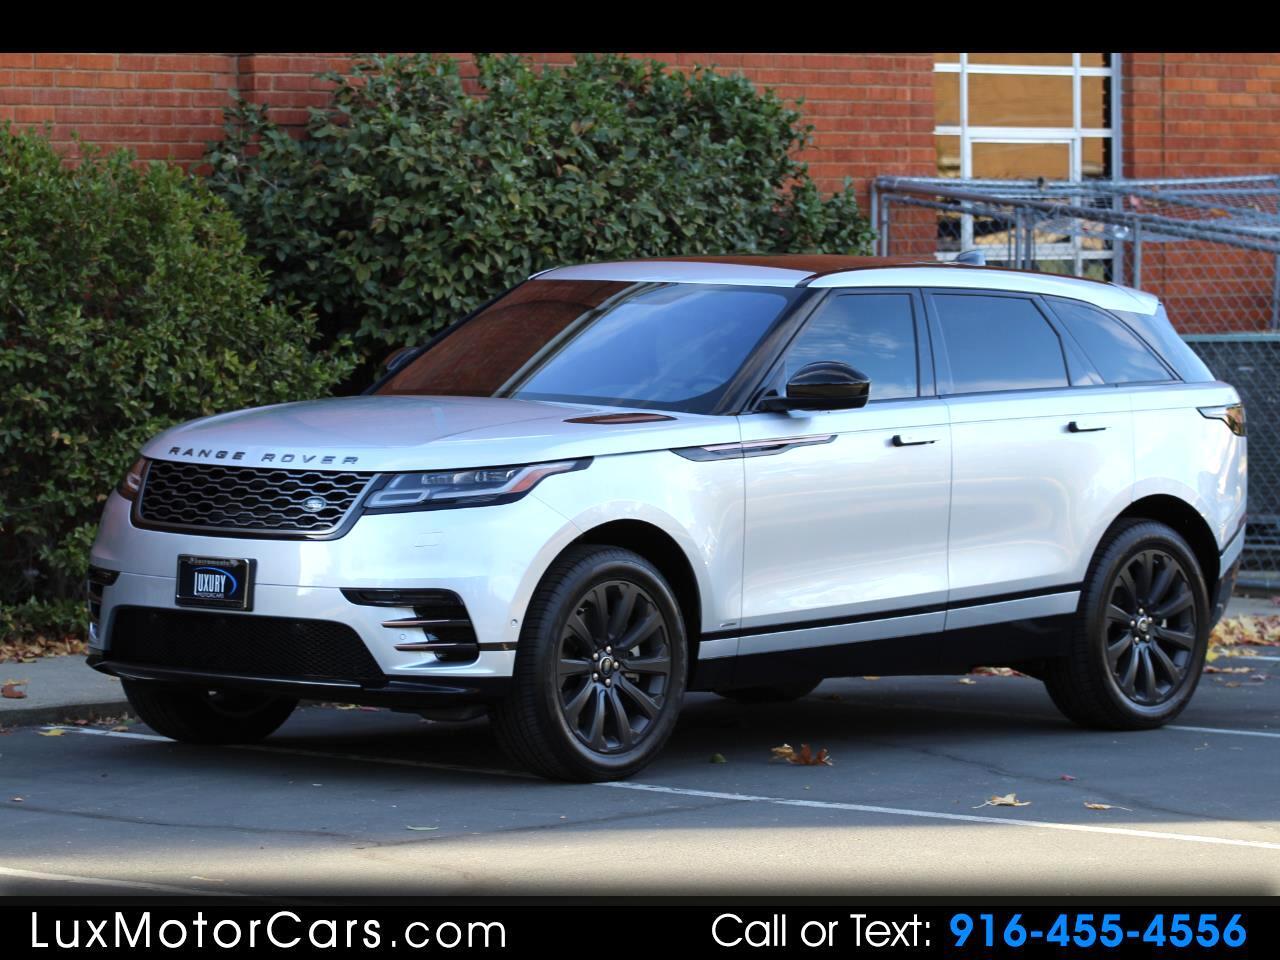 Used 2018 Land Rover Range Rover Velar For Sale In Sacramento Ca